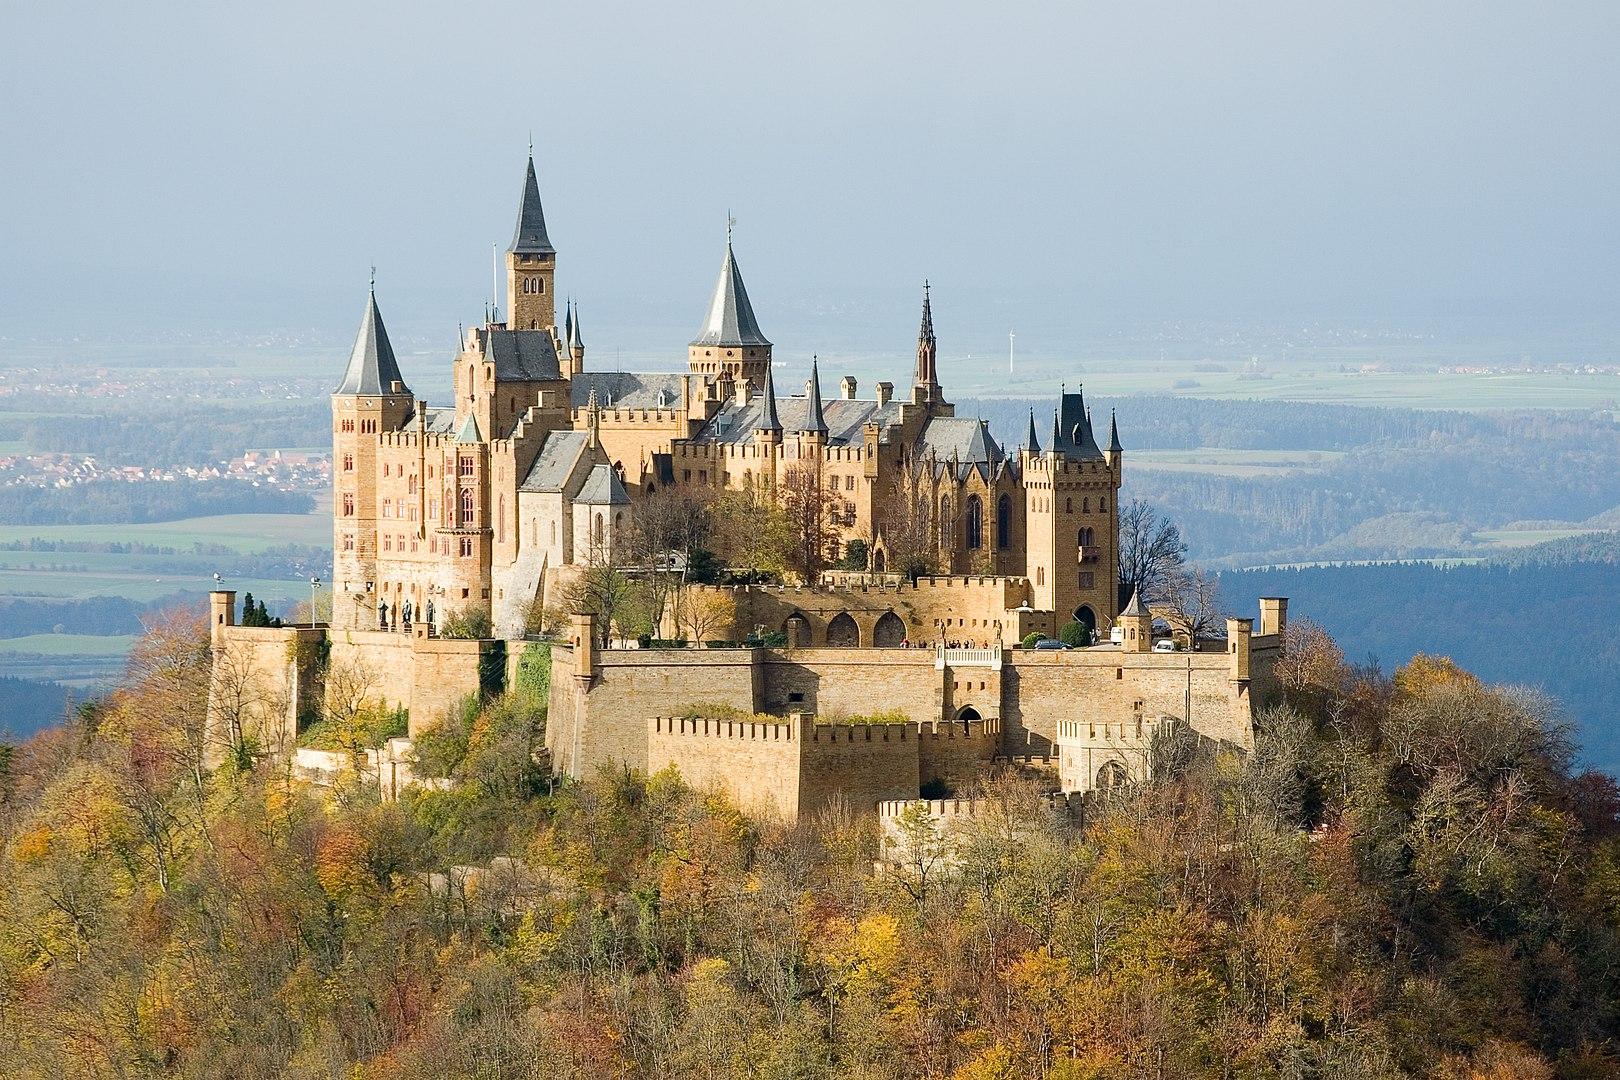 Burg Hohenzollern near Hechingen in Swabian Jura